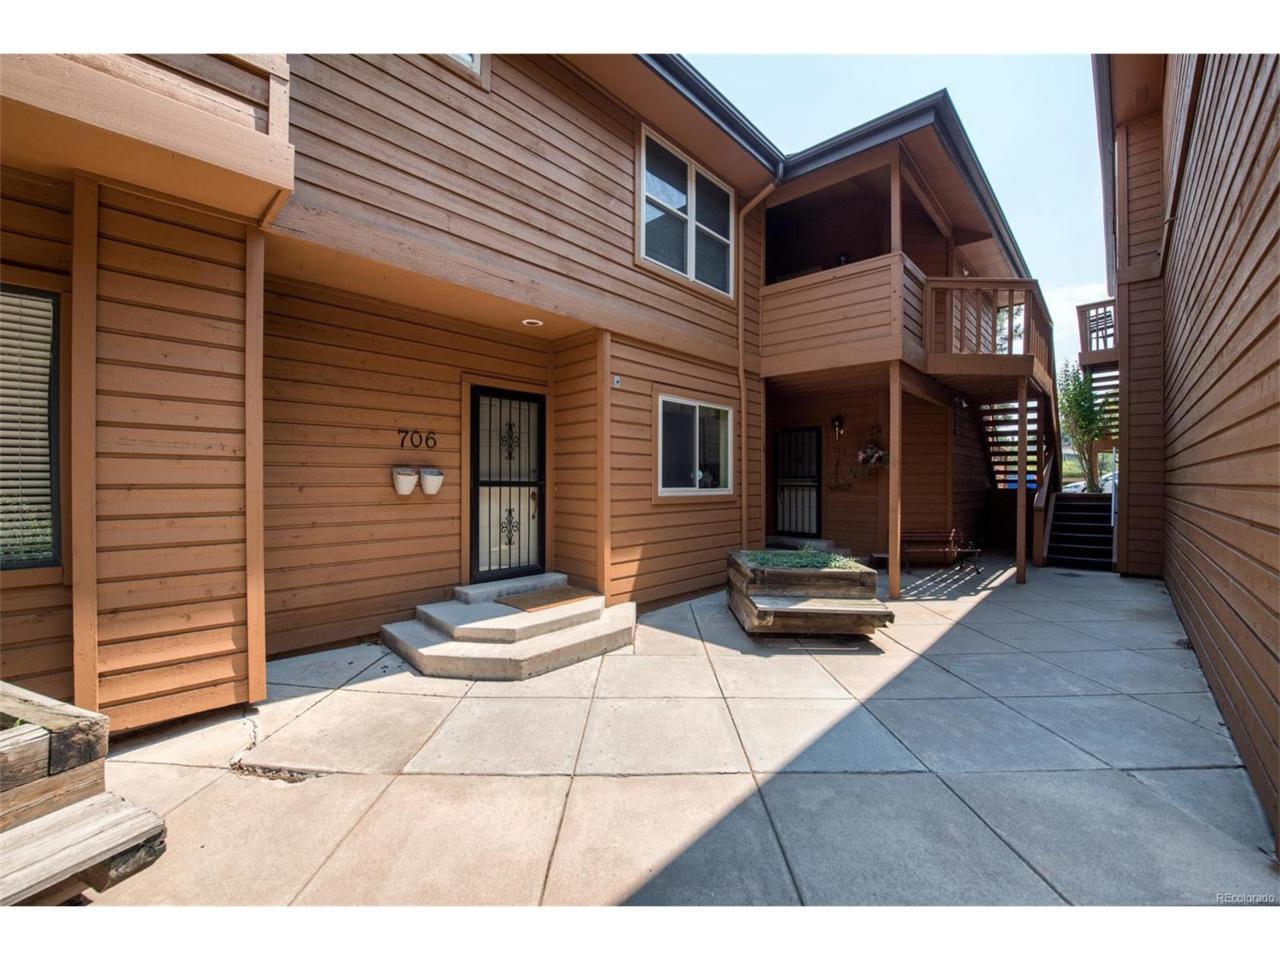 5555 E Briarwood Avenue #709, Centennial, CO 80122 (MLS #4221460) :: 8z Real Estate